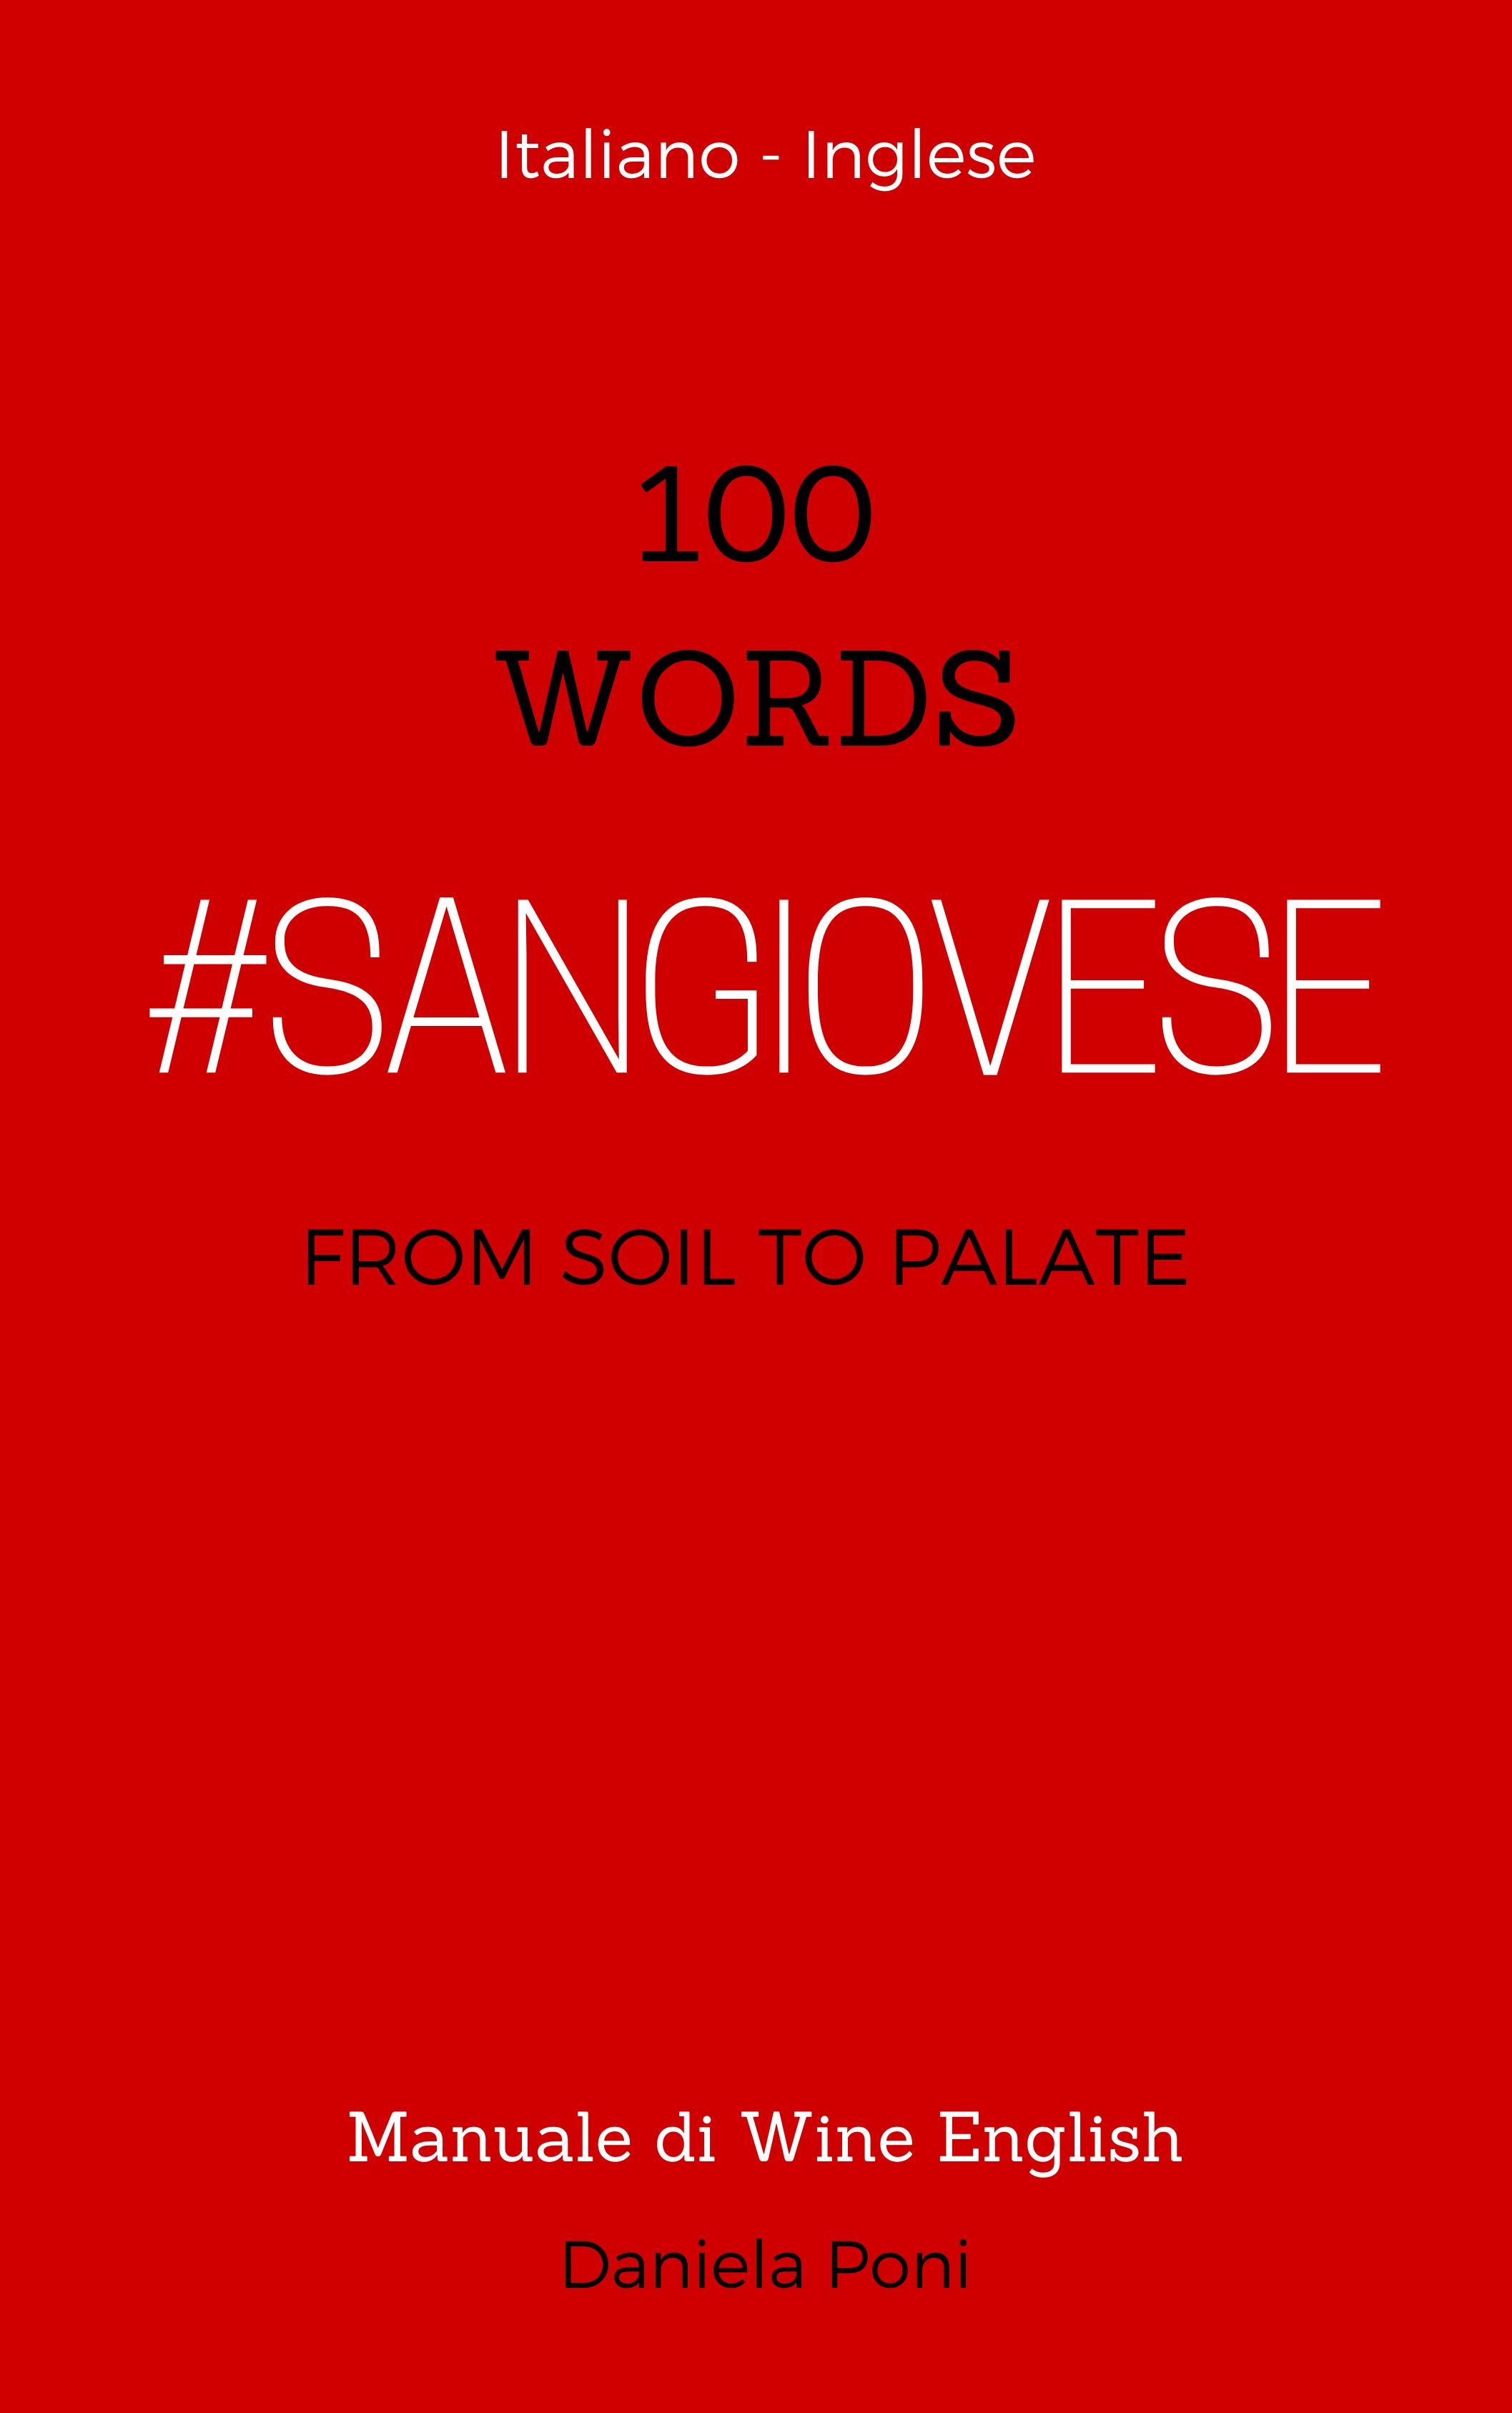 wine english sangiovese